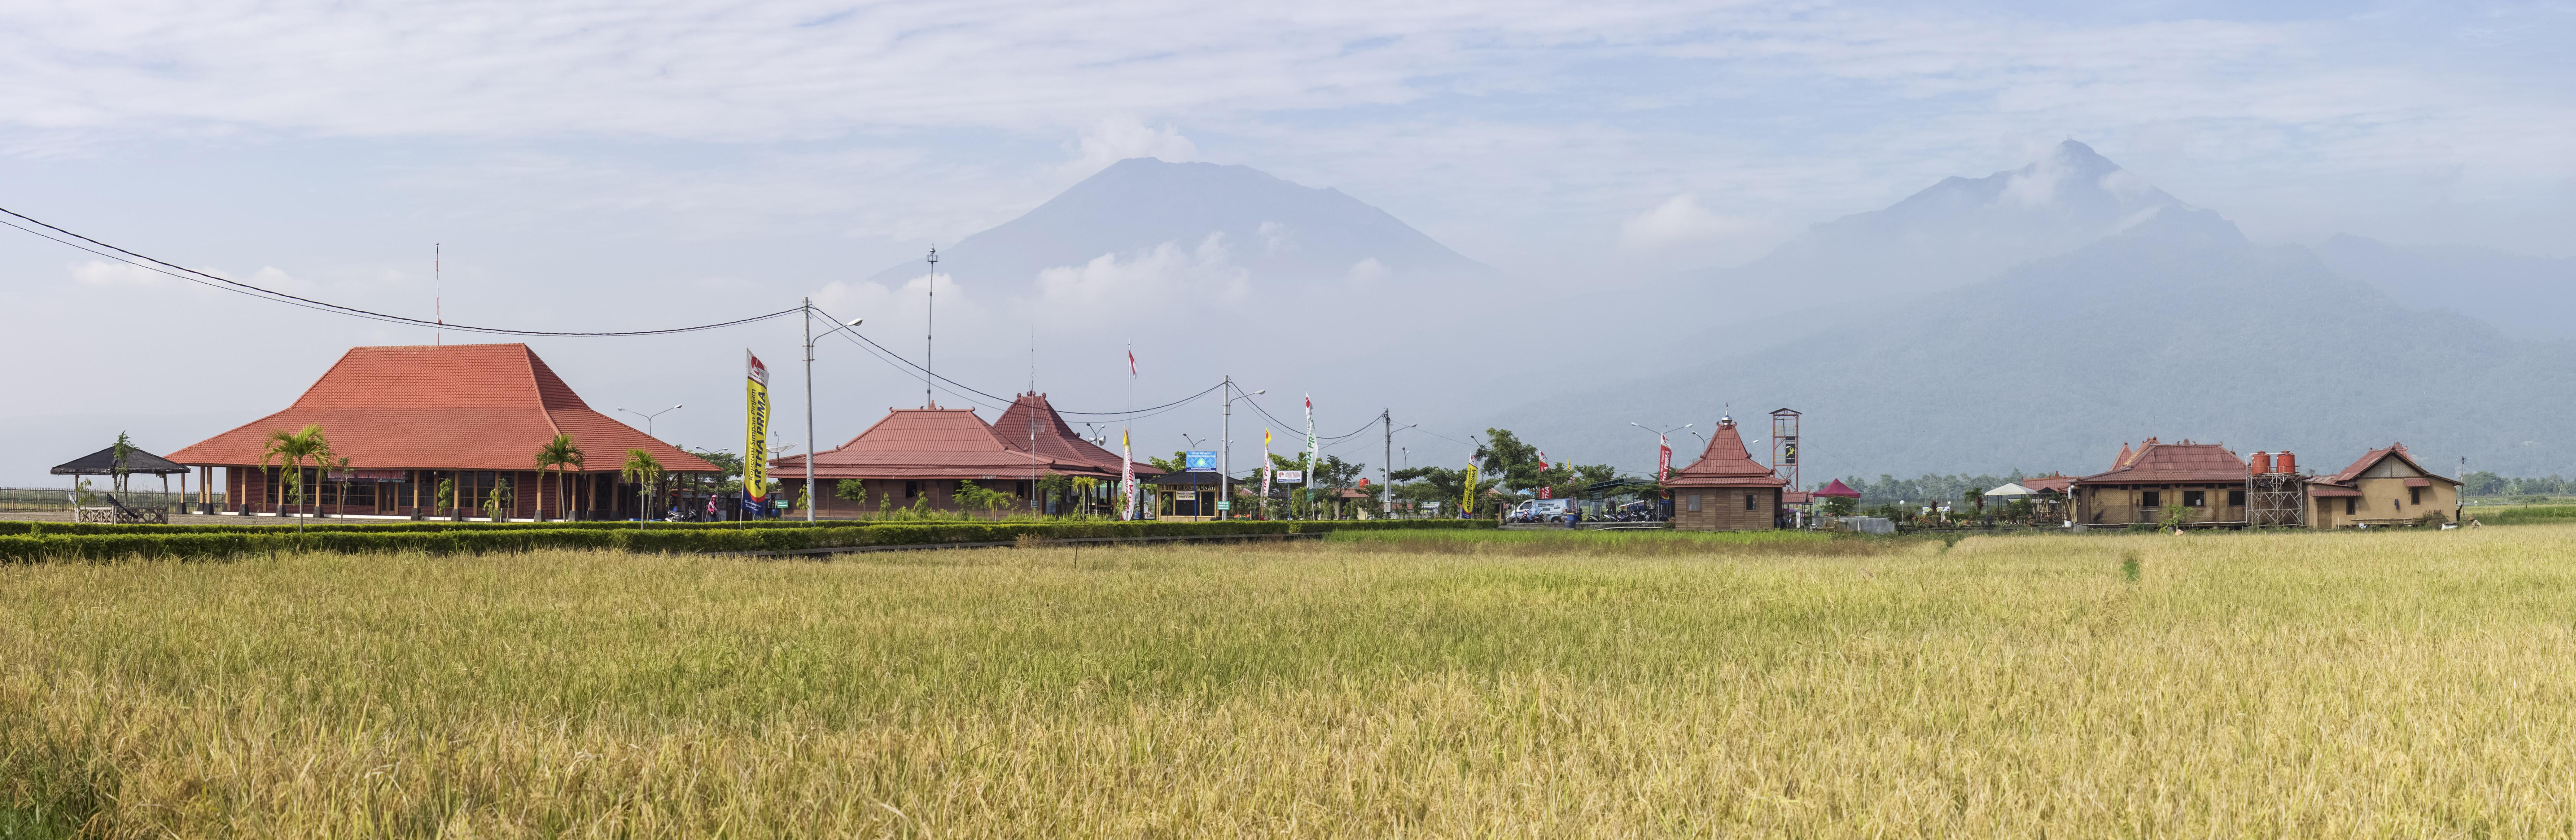 kampung rawa, from a distance 2014-06-20 (02).jpg